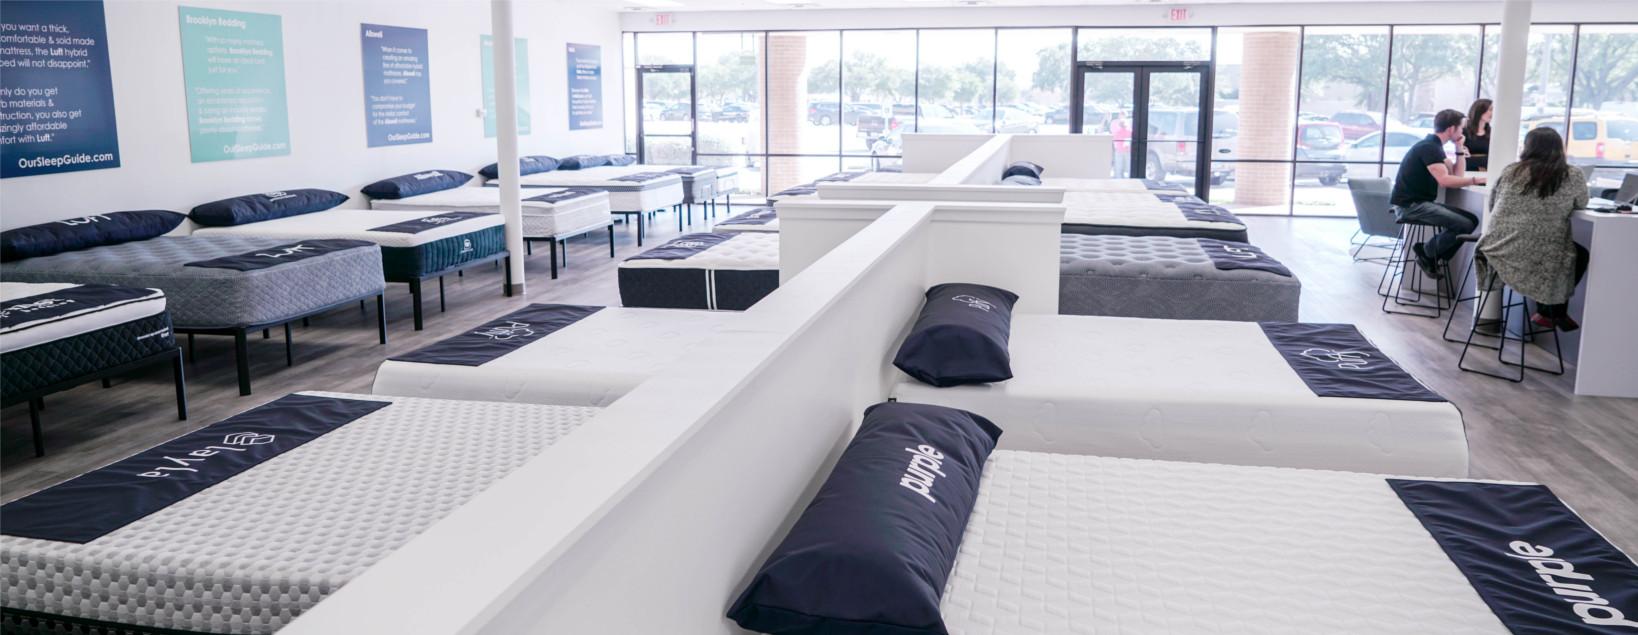 our sleep guide online austin showroom